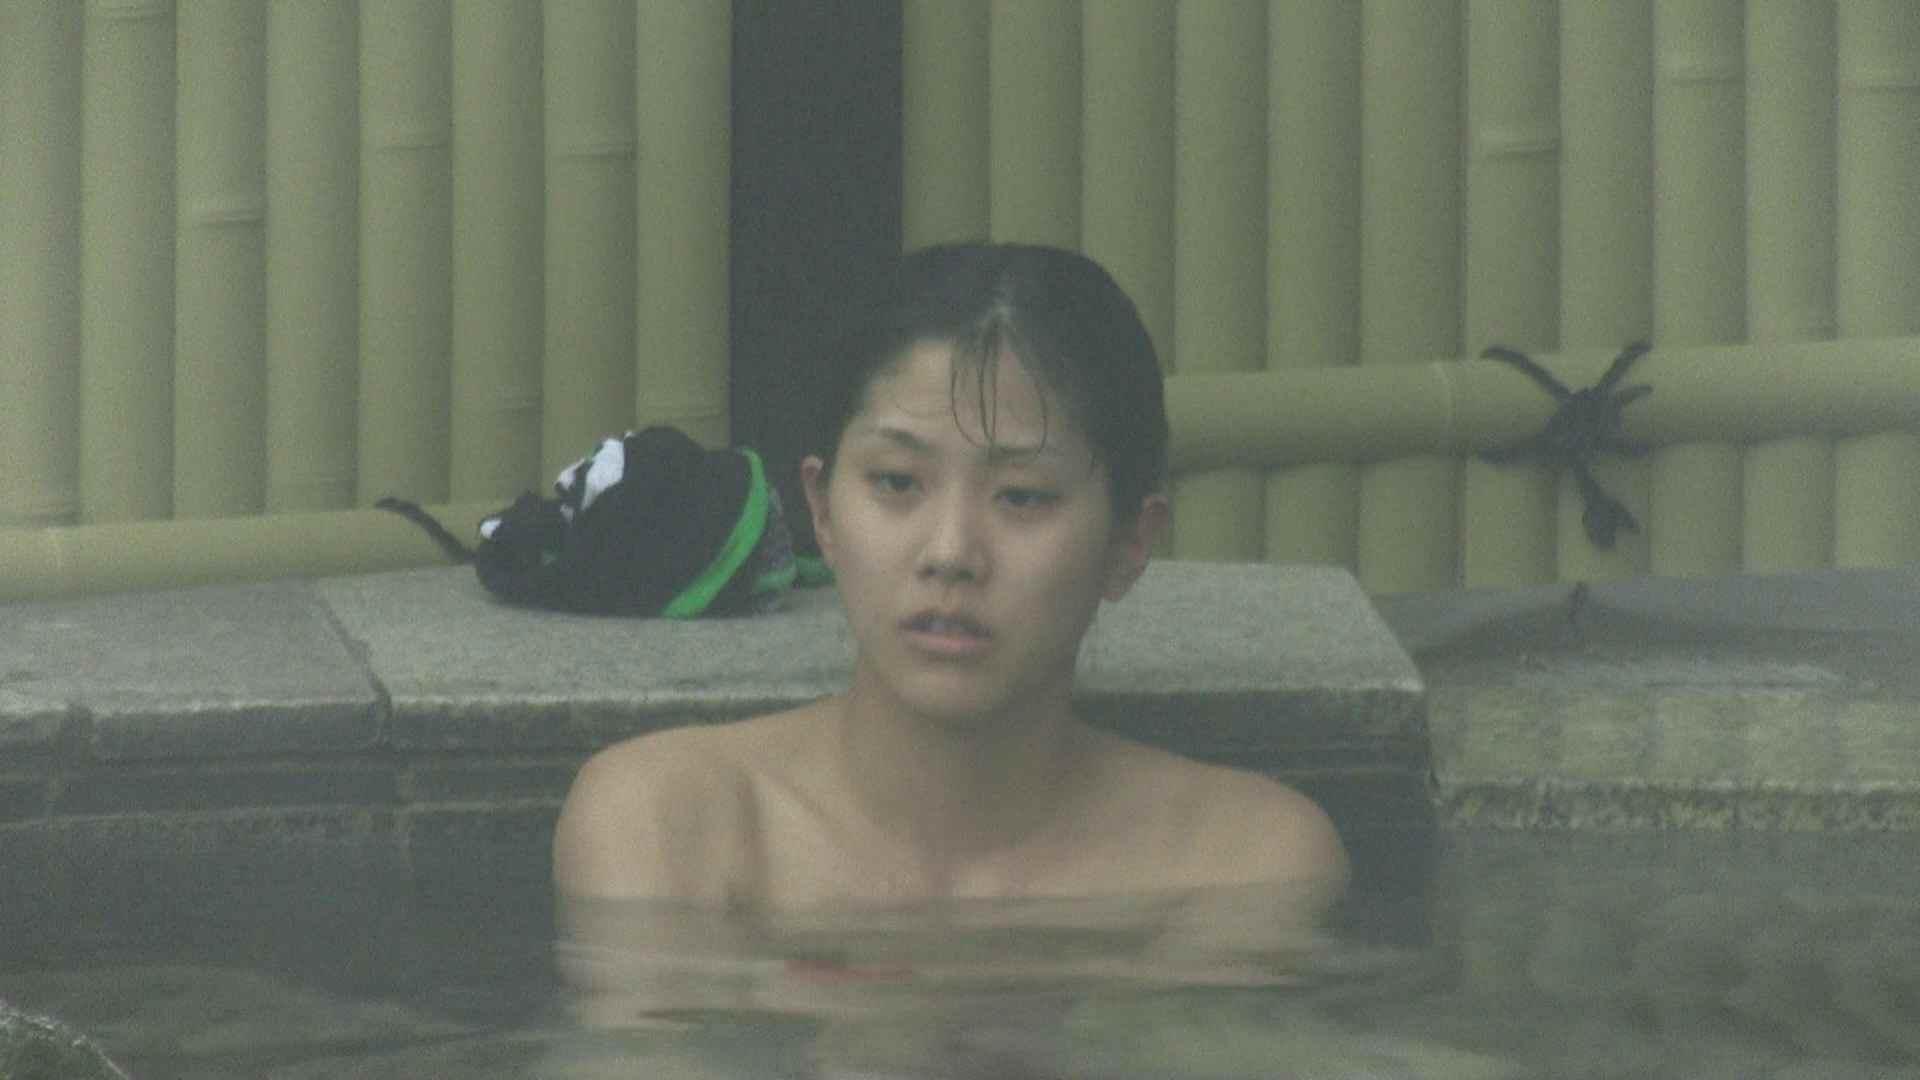 Aquaな露天風呂Vol.174 盗撮シリーズ | 露天風呂編  86PIX 61